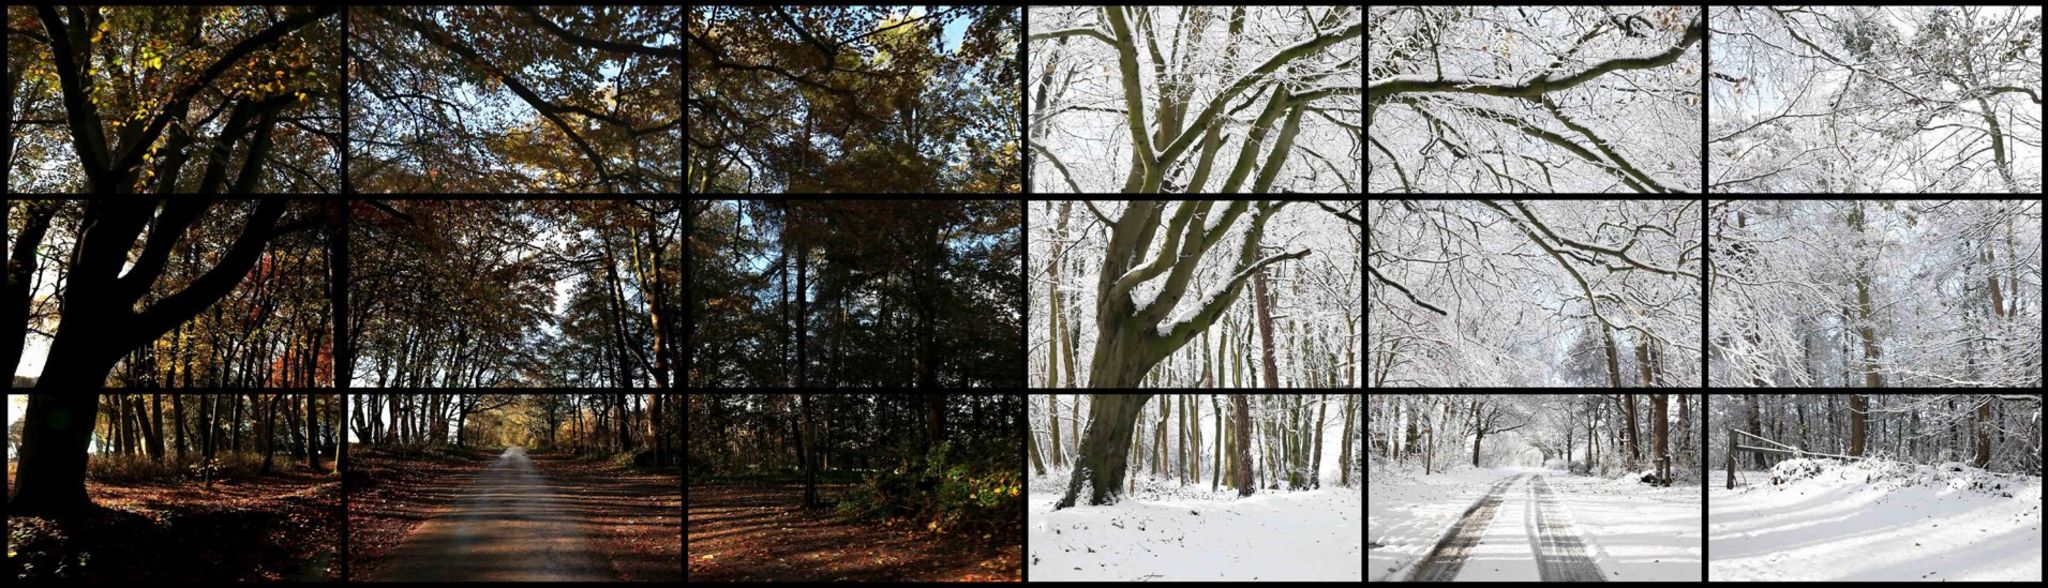 Nov. 7th, Nov. 26th 2010, Woldgate Woods, 11.30 am and 9.30 am by David Hockney